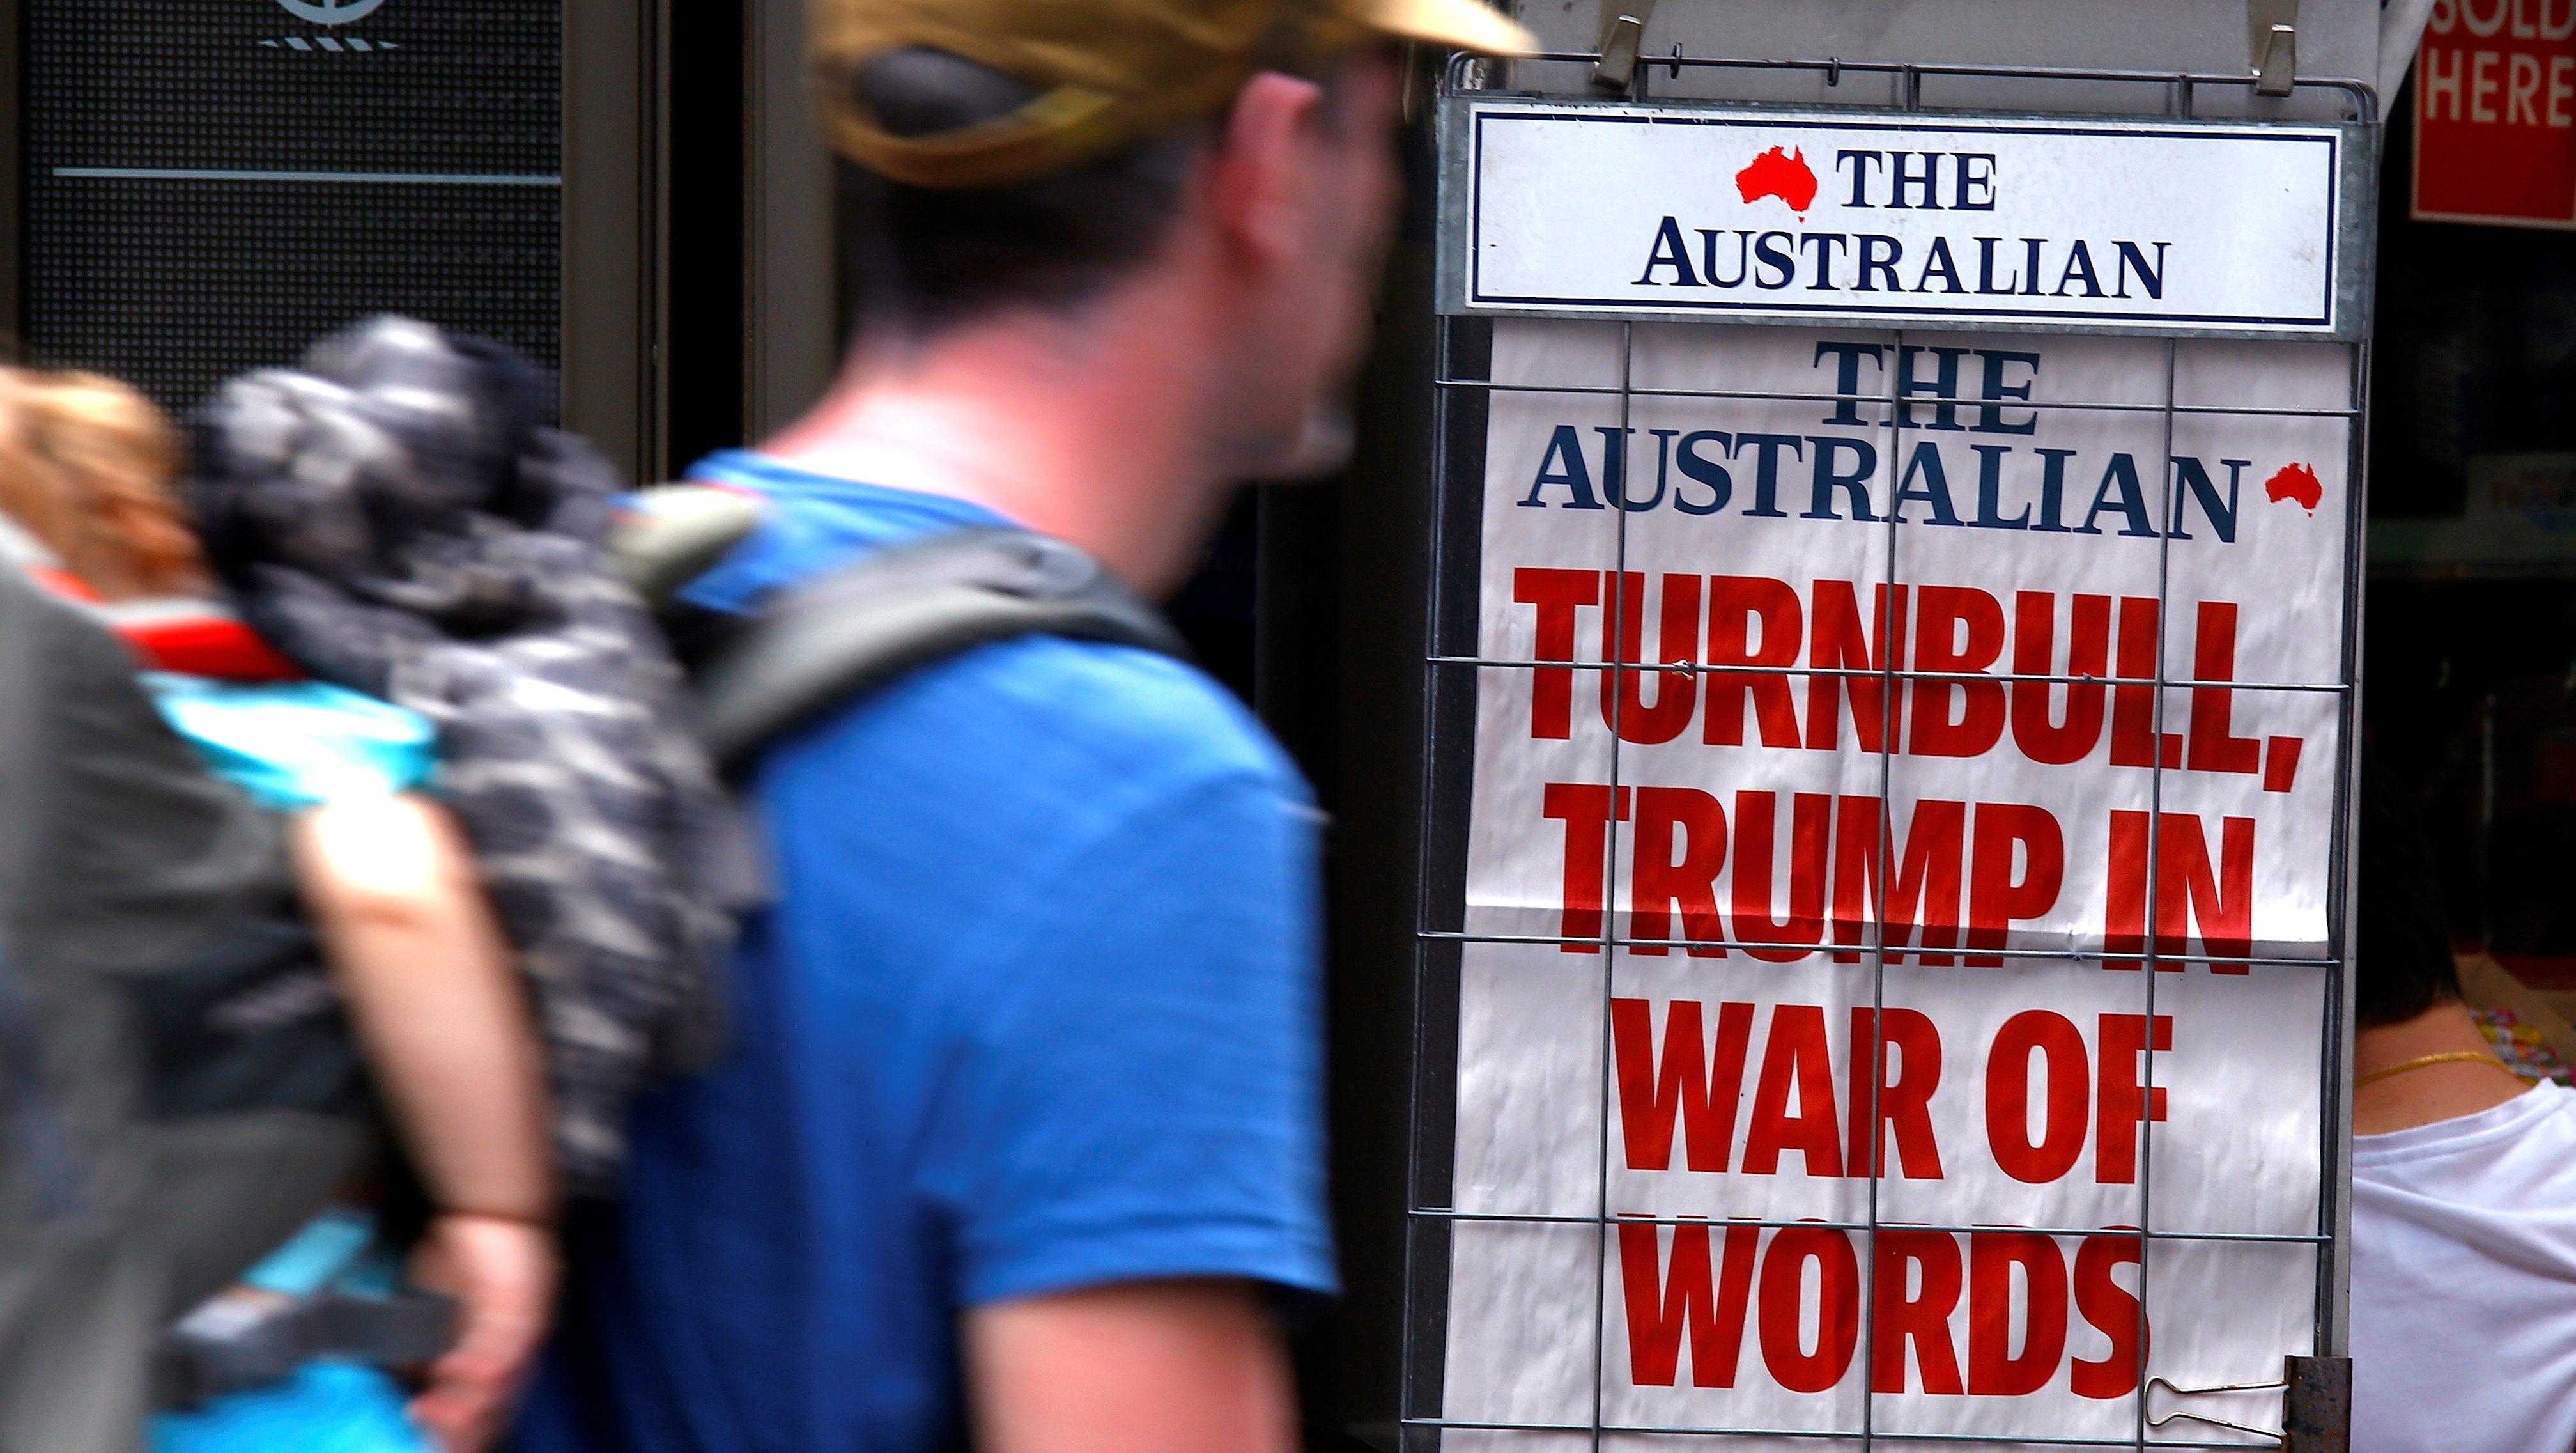 A pedestrian looks at a newspaper headline regarding U.S. President Donald Trump and Australian Prime Minister Malcolm Turnbull in central Sydney, Australia, February 3, 2017.